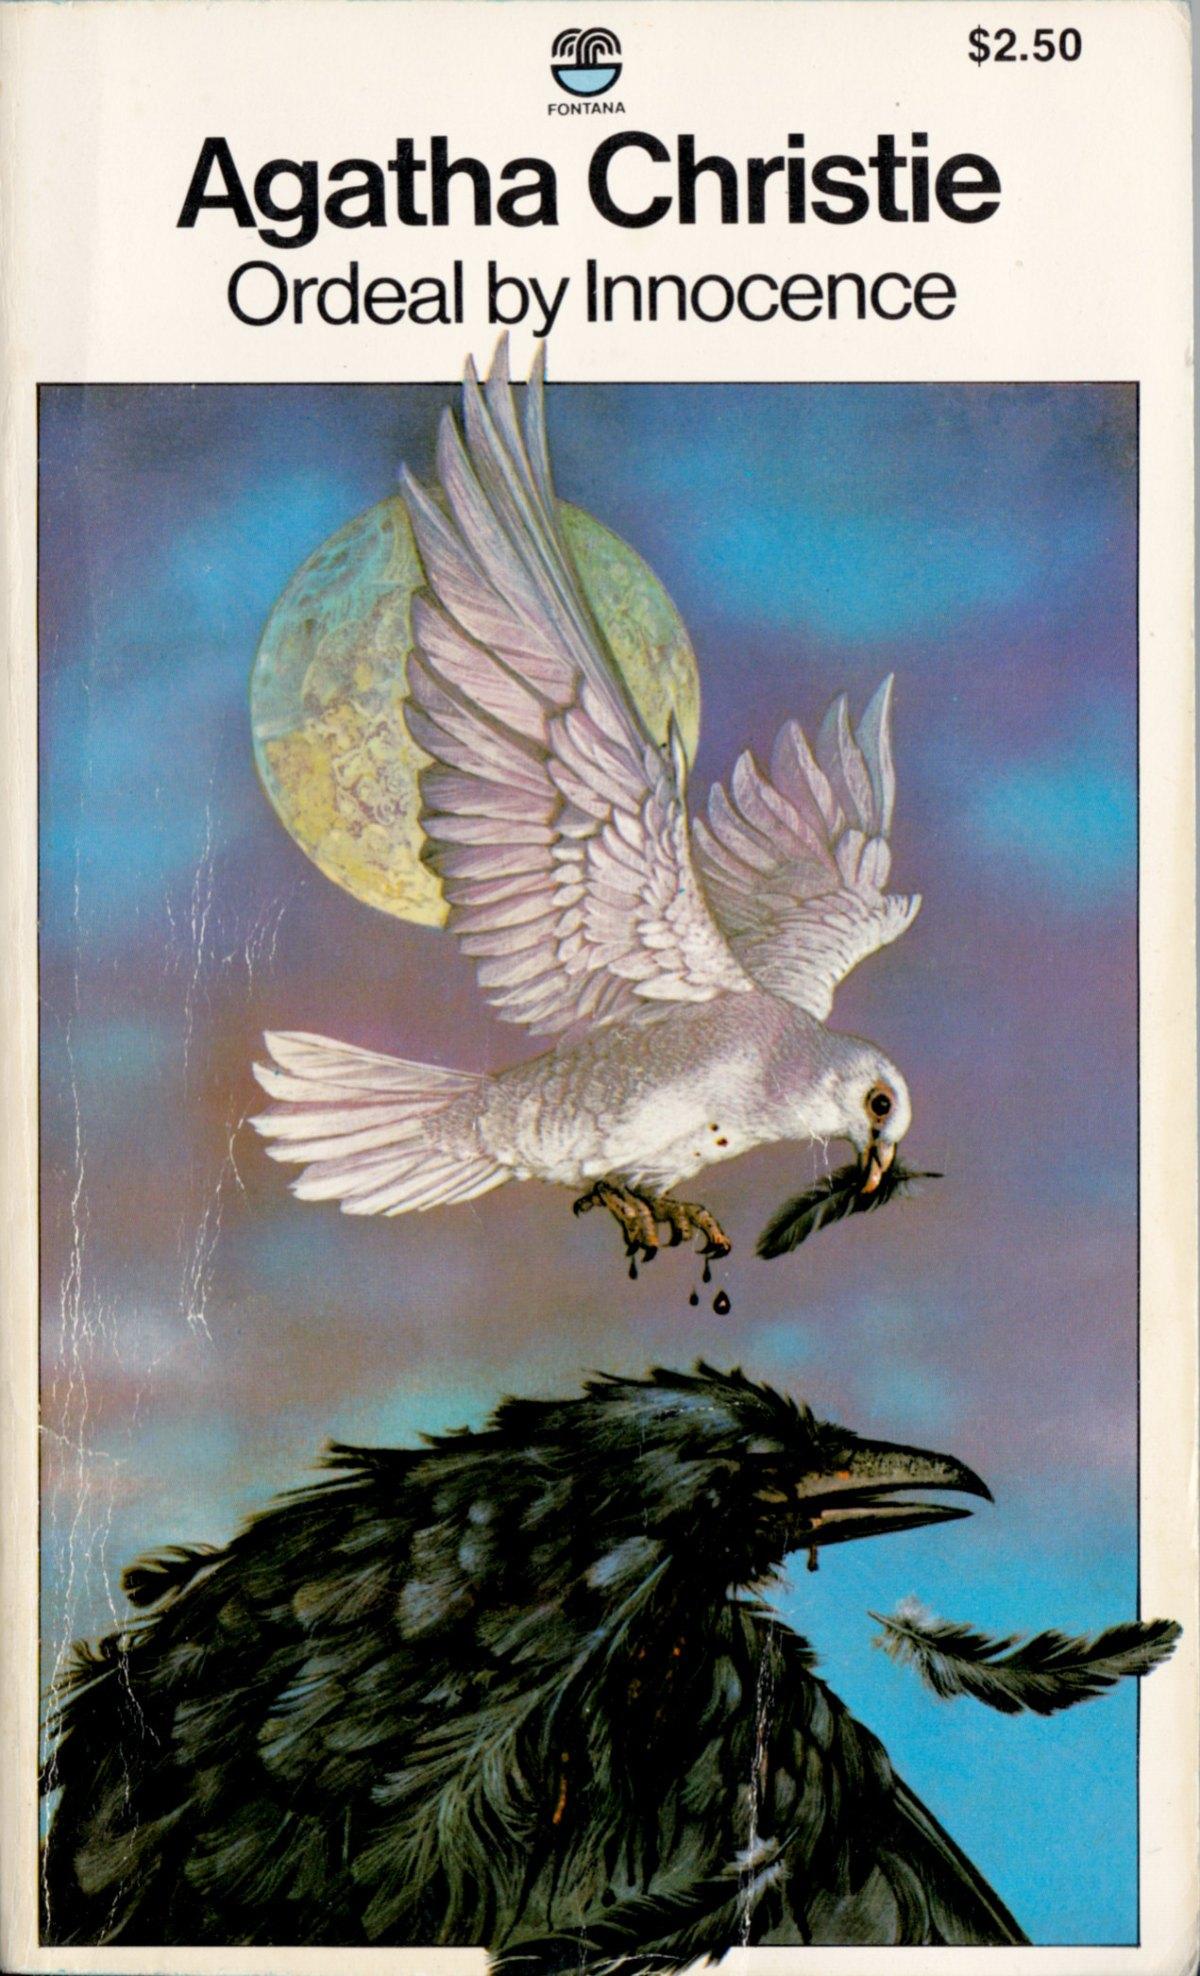 Agatha Christie Tom Adams Ordeal by Innocence Fontana 1980